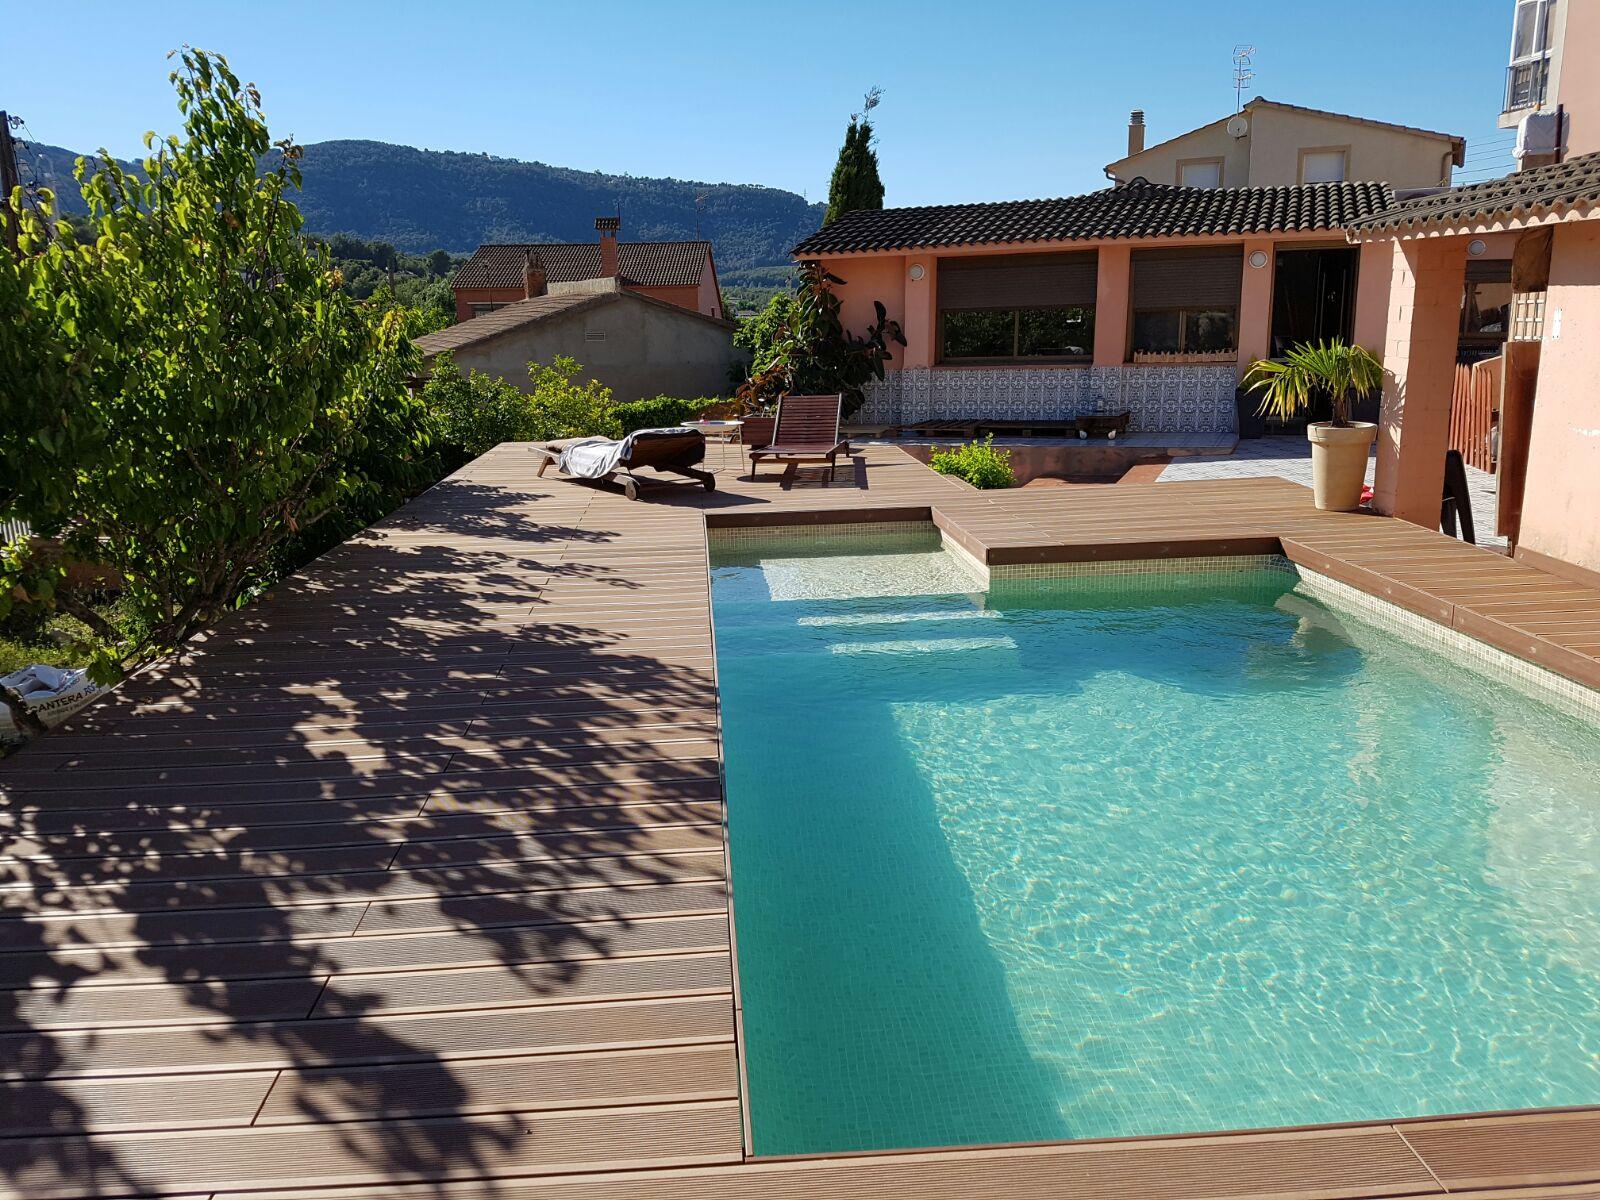 Construcci n de piscinas aquadynamics for Construccion de piscinas en lleida